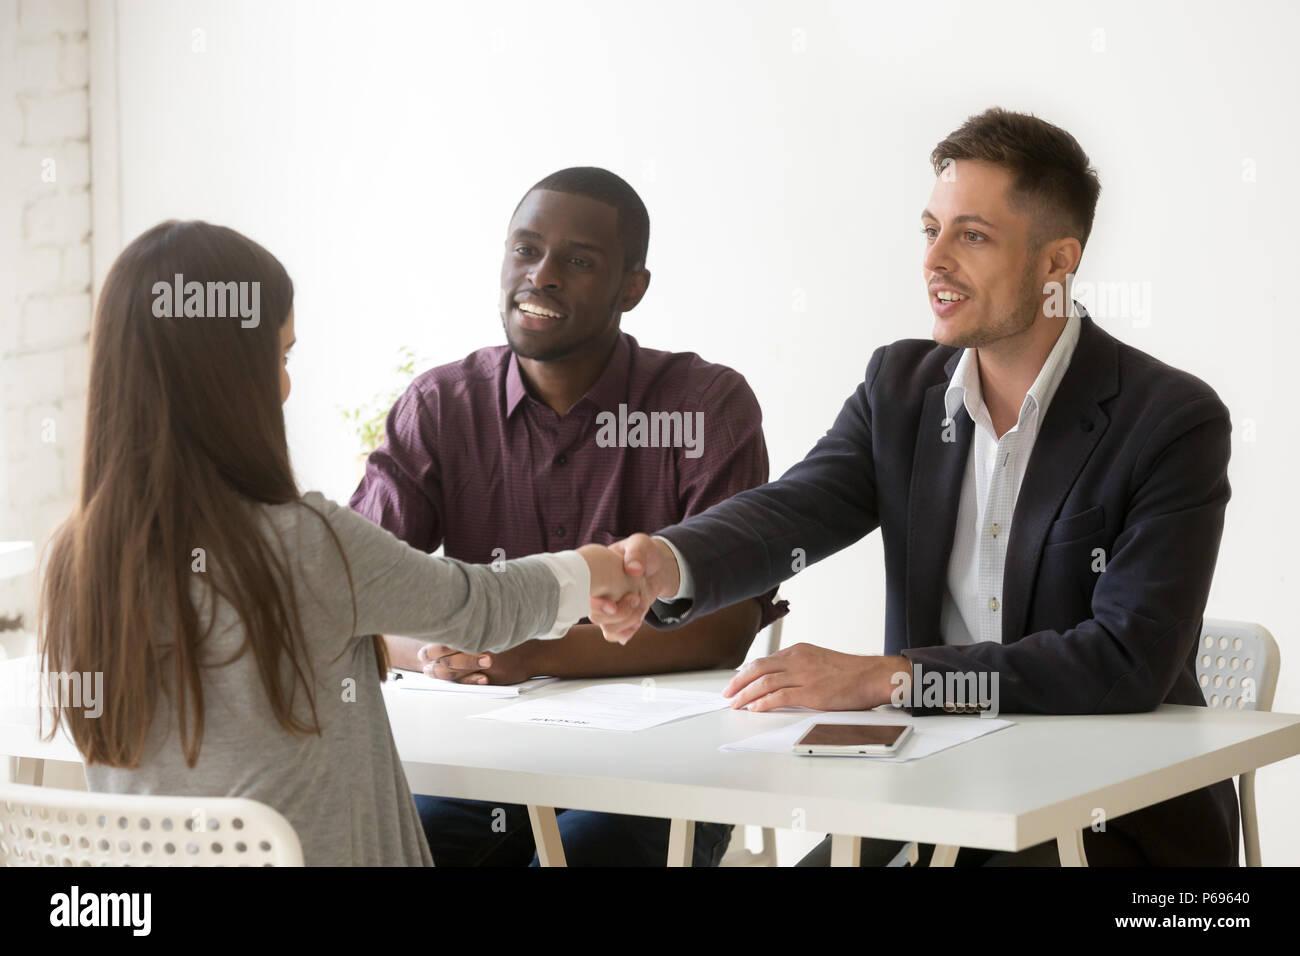 Multiethnic employers greeting female job candidate with handsha - Stock Image